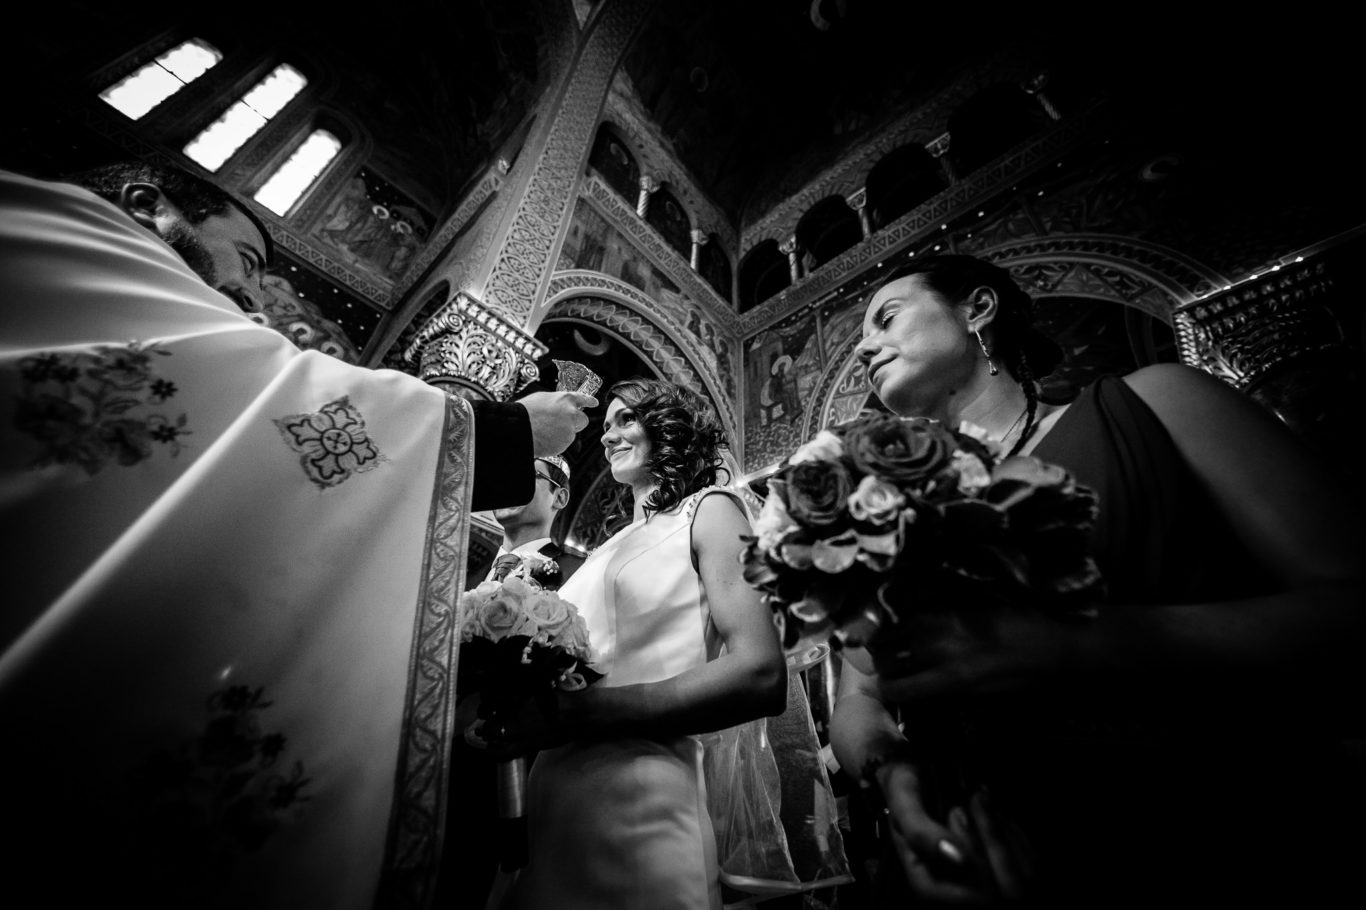 0453-fotografie-nunta-bucuresti-dana-radu-fotograf-ciprian-dumitrescu-dc1_3971